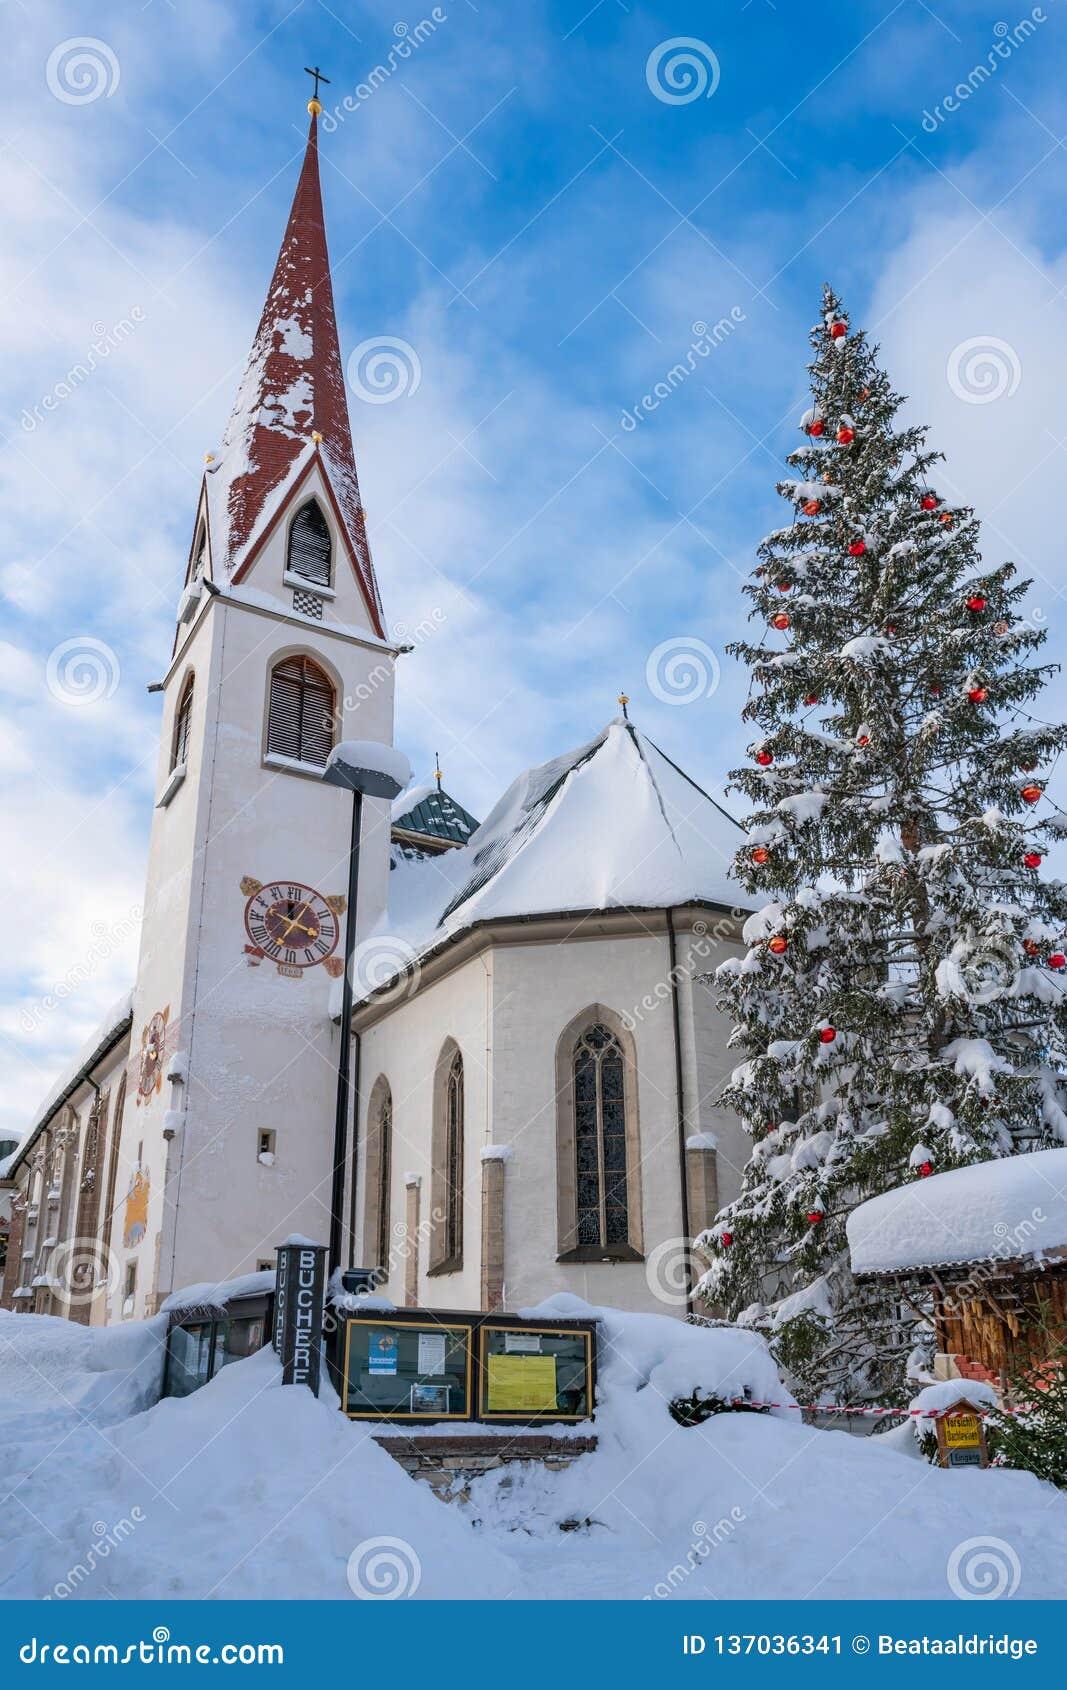 Christmas In Austria 2019.St Oswald Parish Church In Seefeld In Austria Editorial